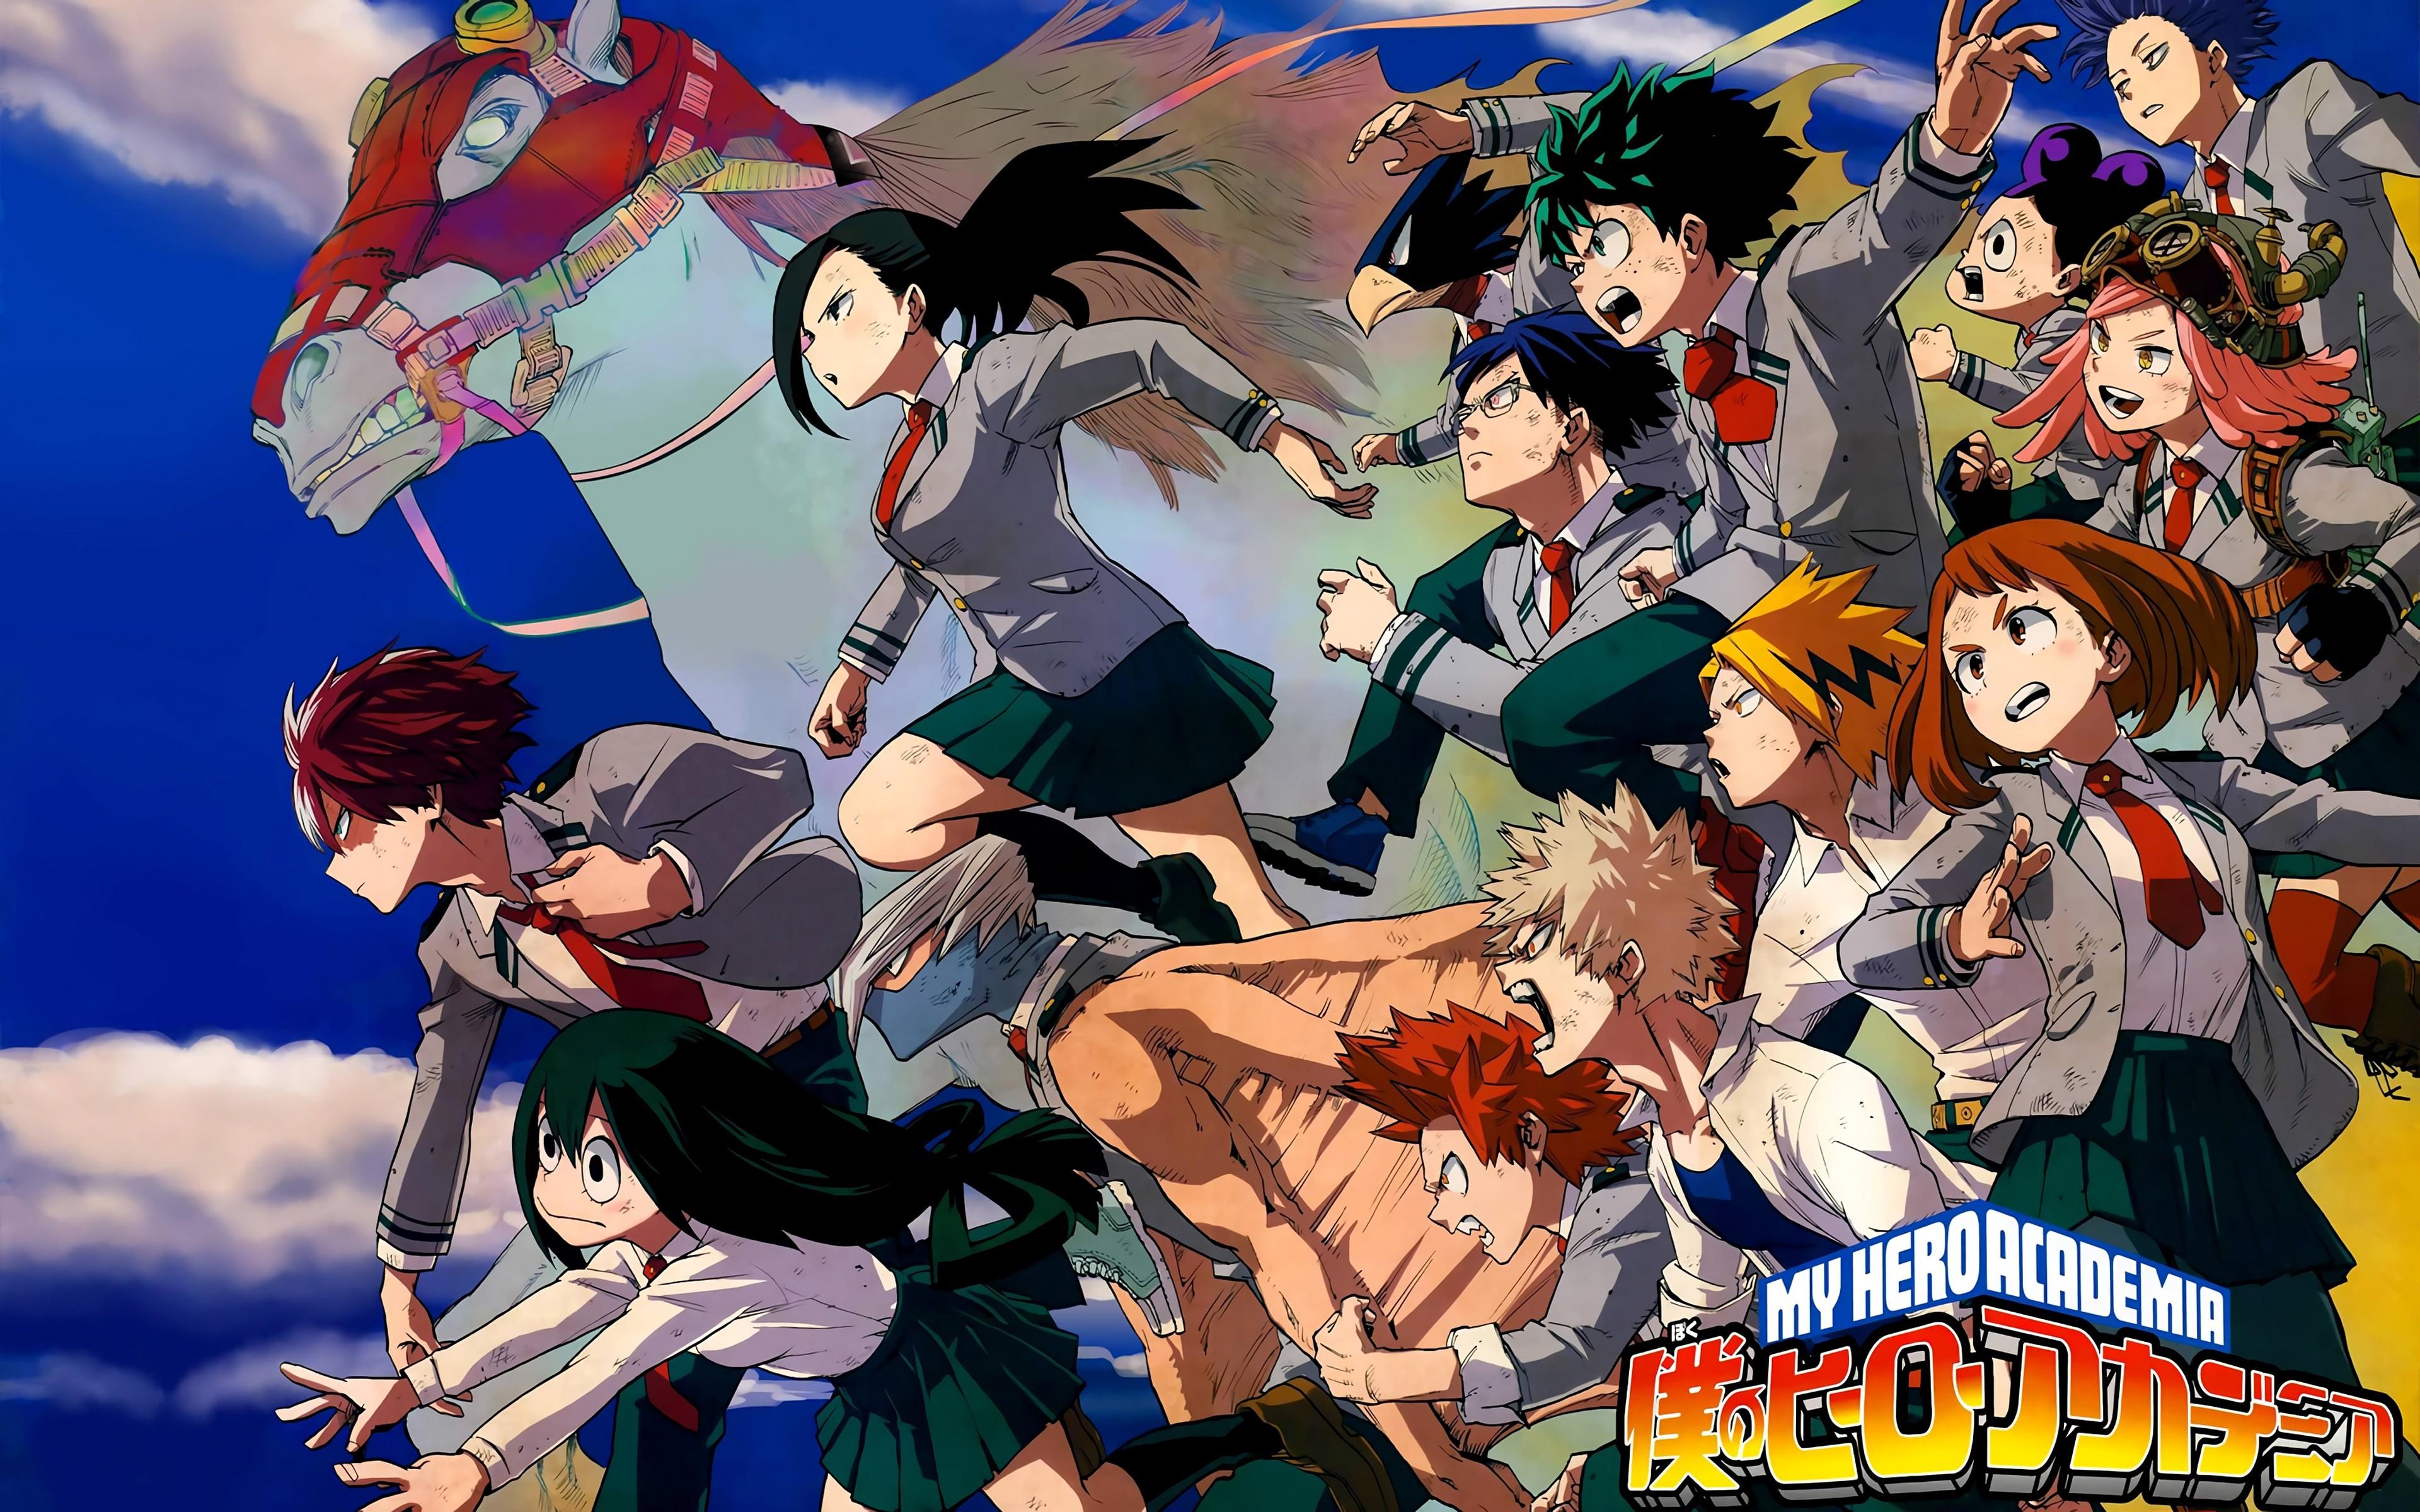 Anime 3840x2400 Boku no Hero Academia anime horse Kaminari Denki